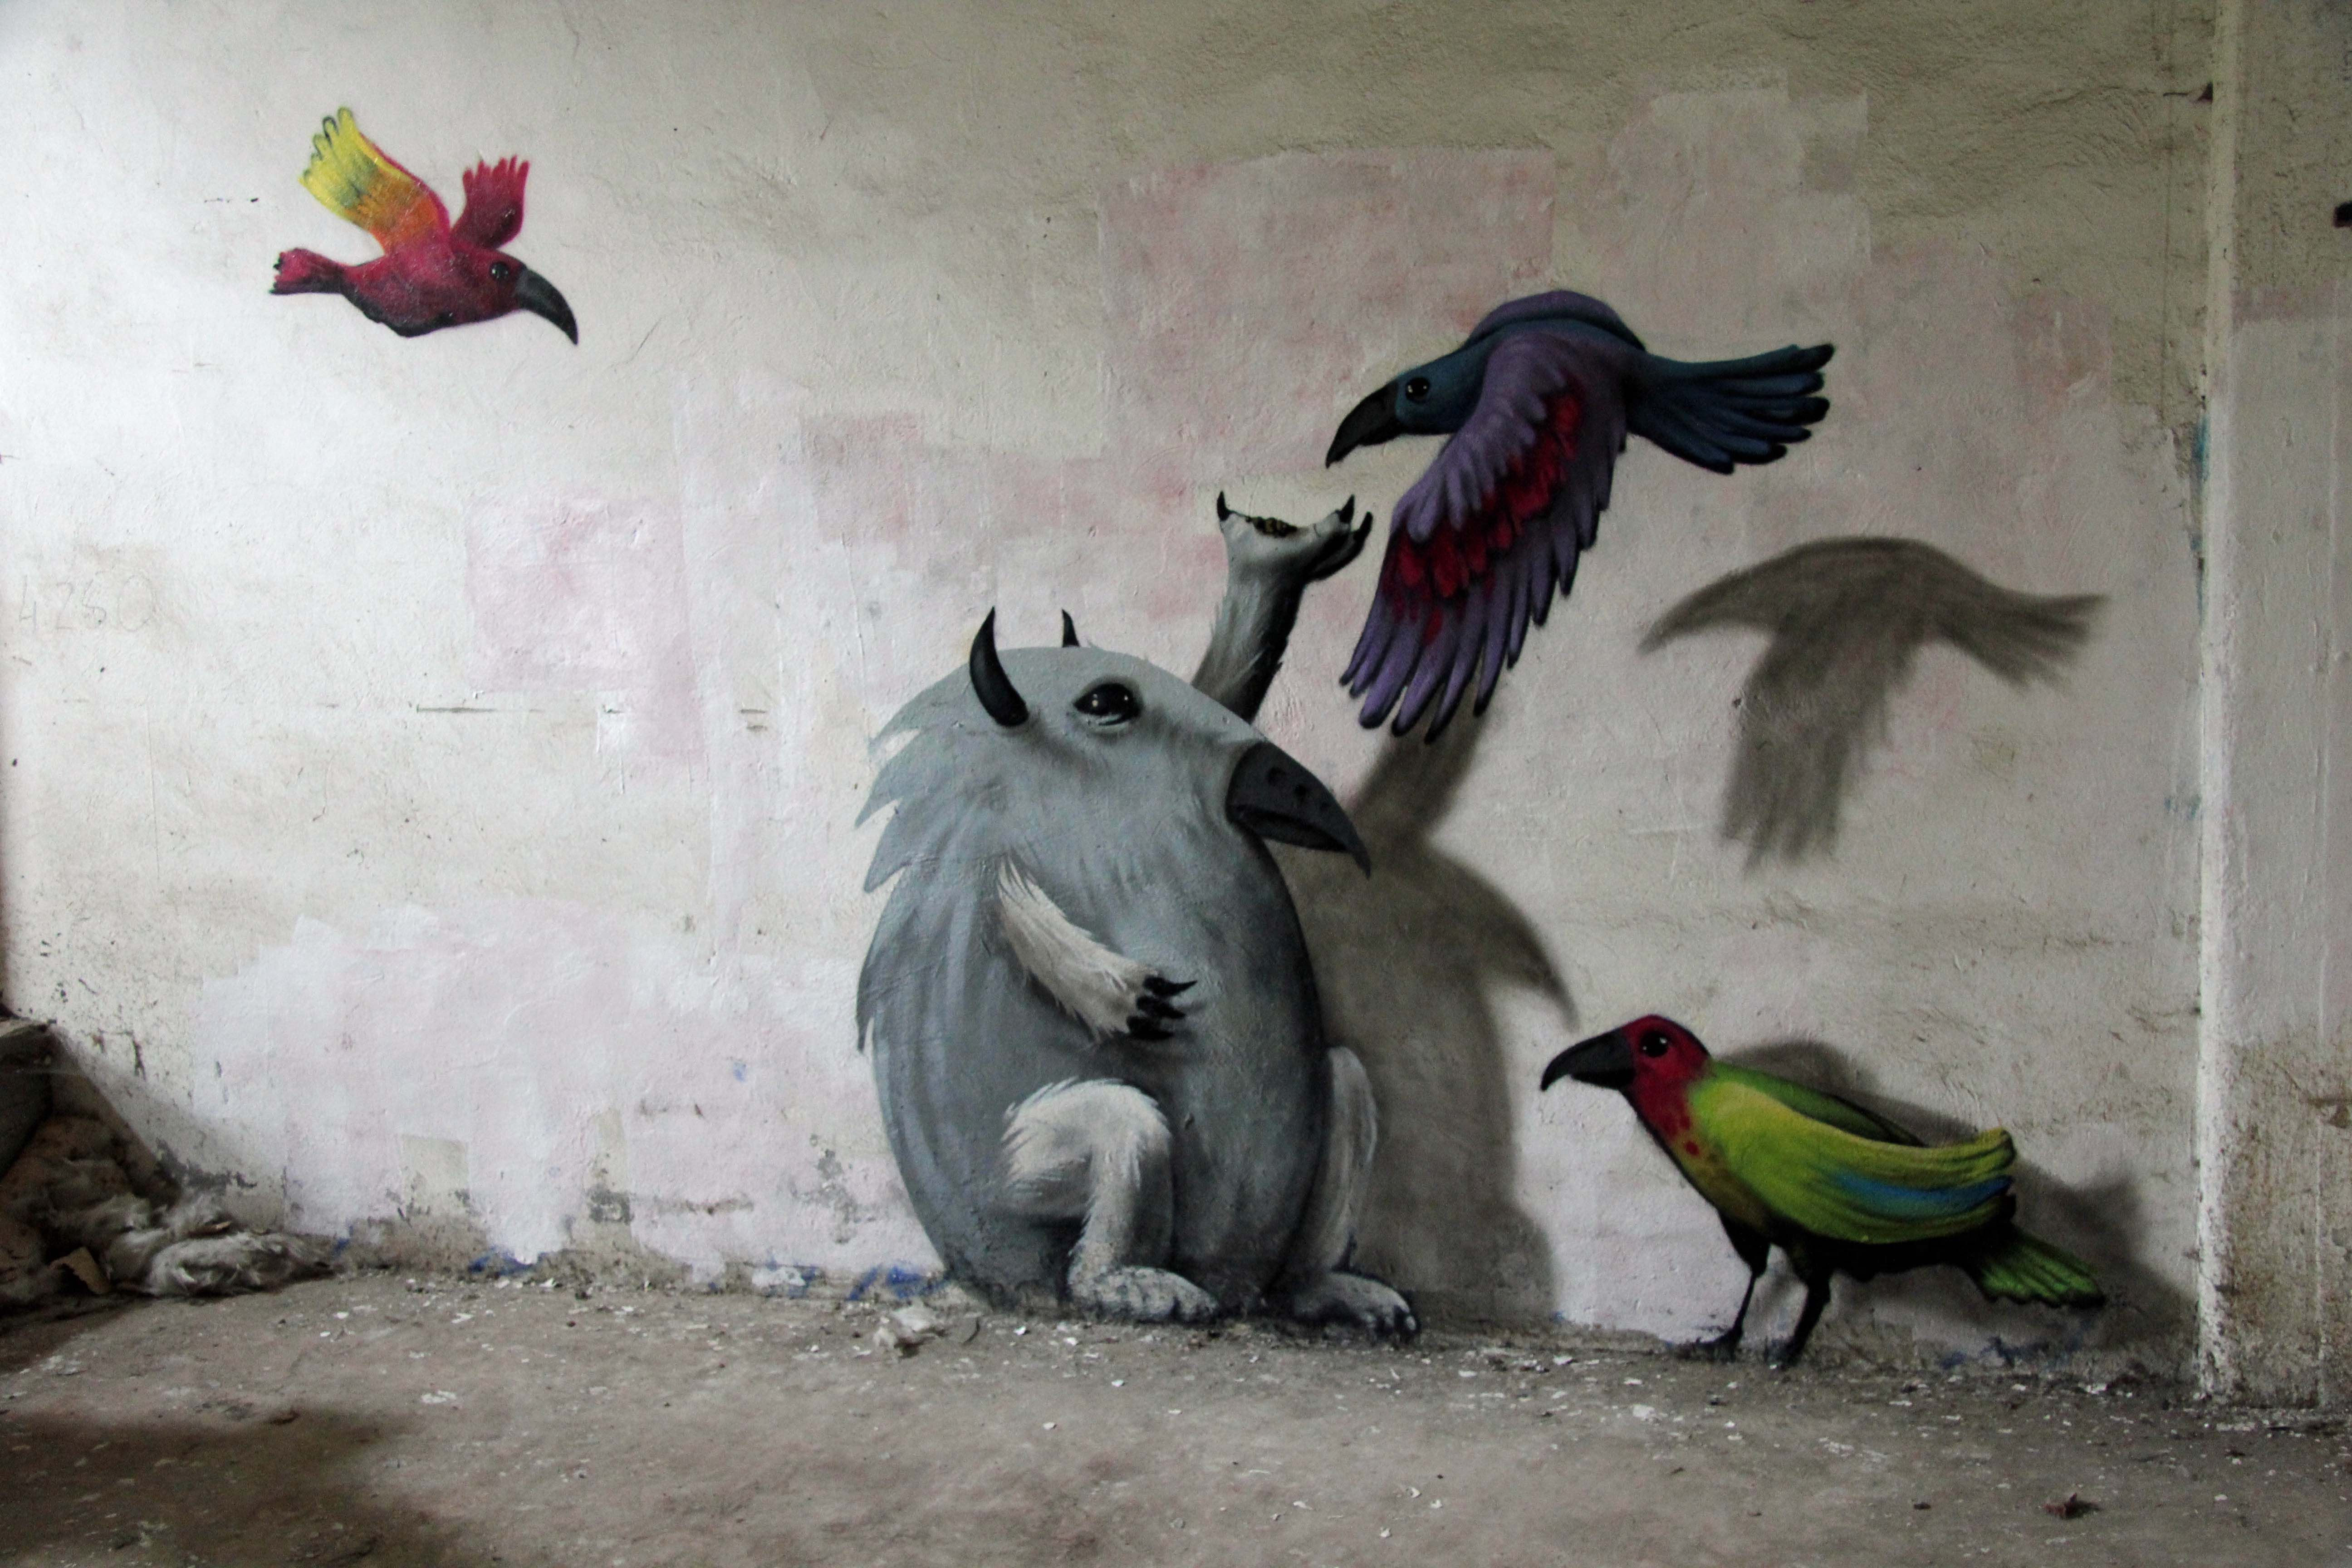 Kim Köster - The Birdman of Wolfswinkel -- http://andberlin.com/2012/10/10/art-on-a-crumbling-canvas-papierfabrik-wolfswinkel/